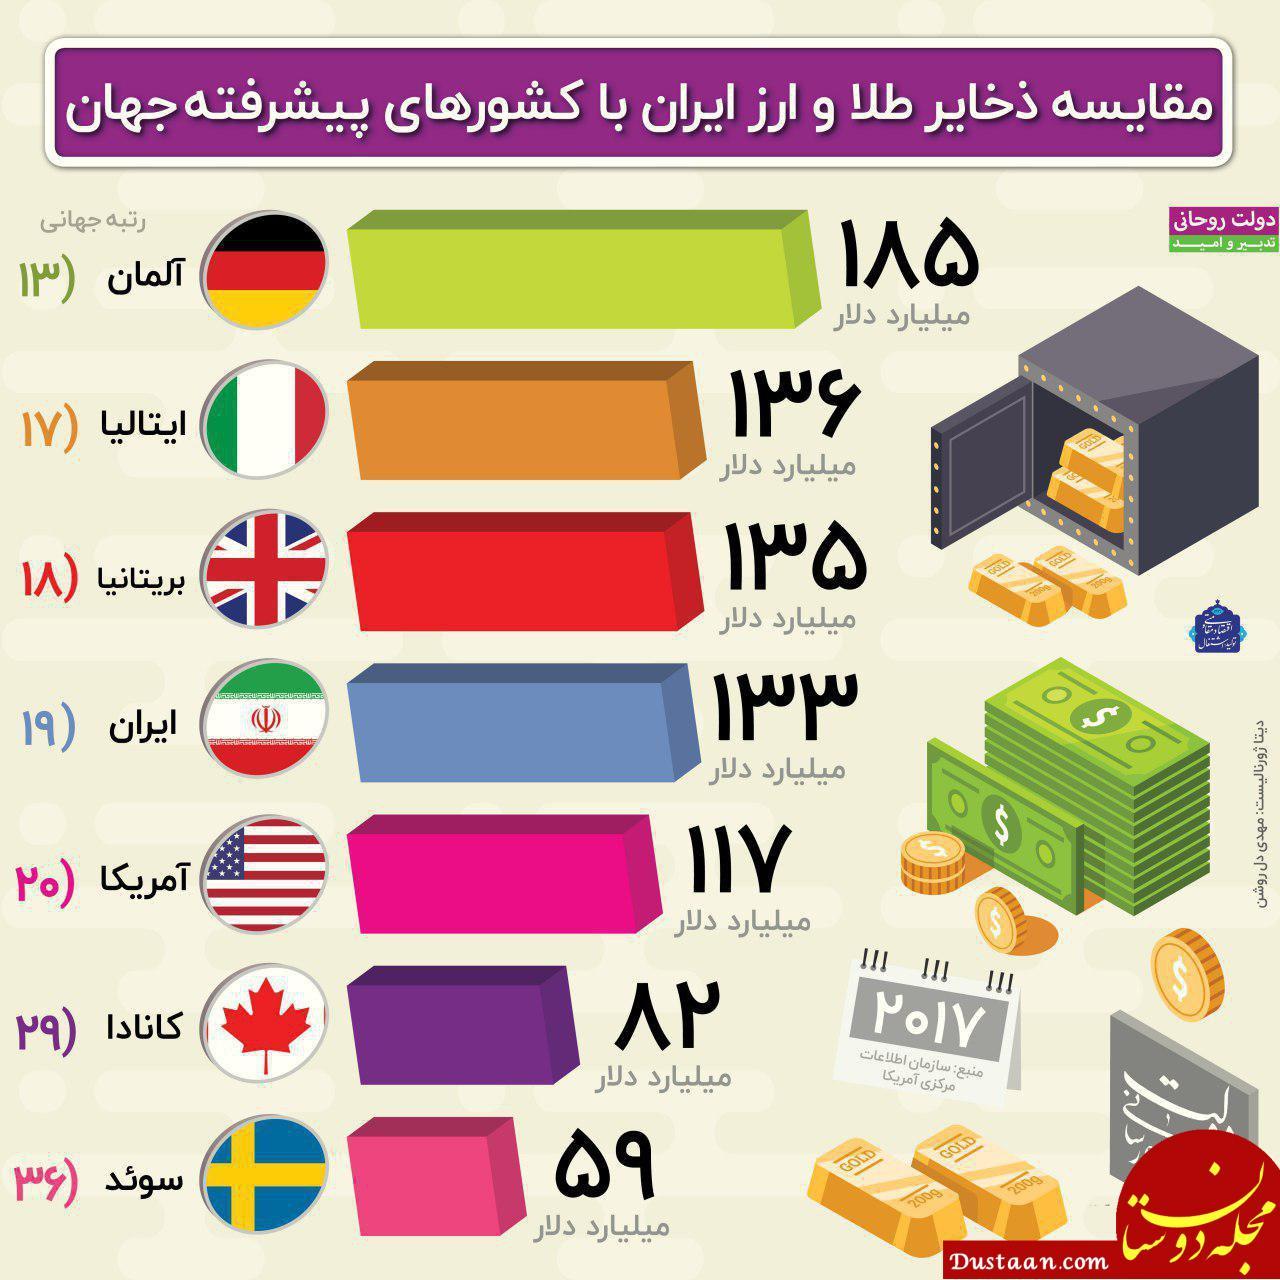 www.dustaan.com مقایسه ذخایر طلا و ارز ایران با کشورهای پیشرفته جهان +اینفوگرافیک